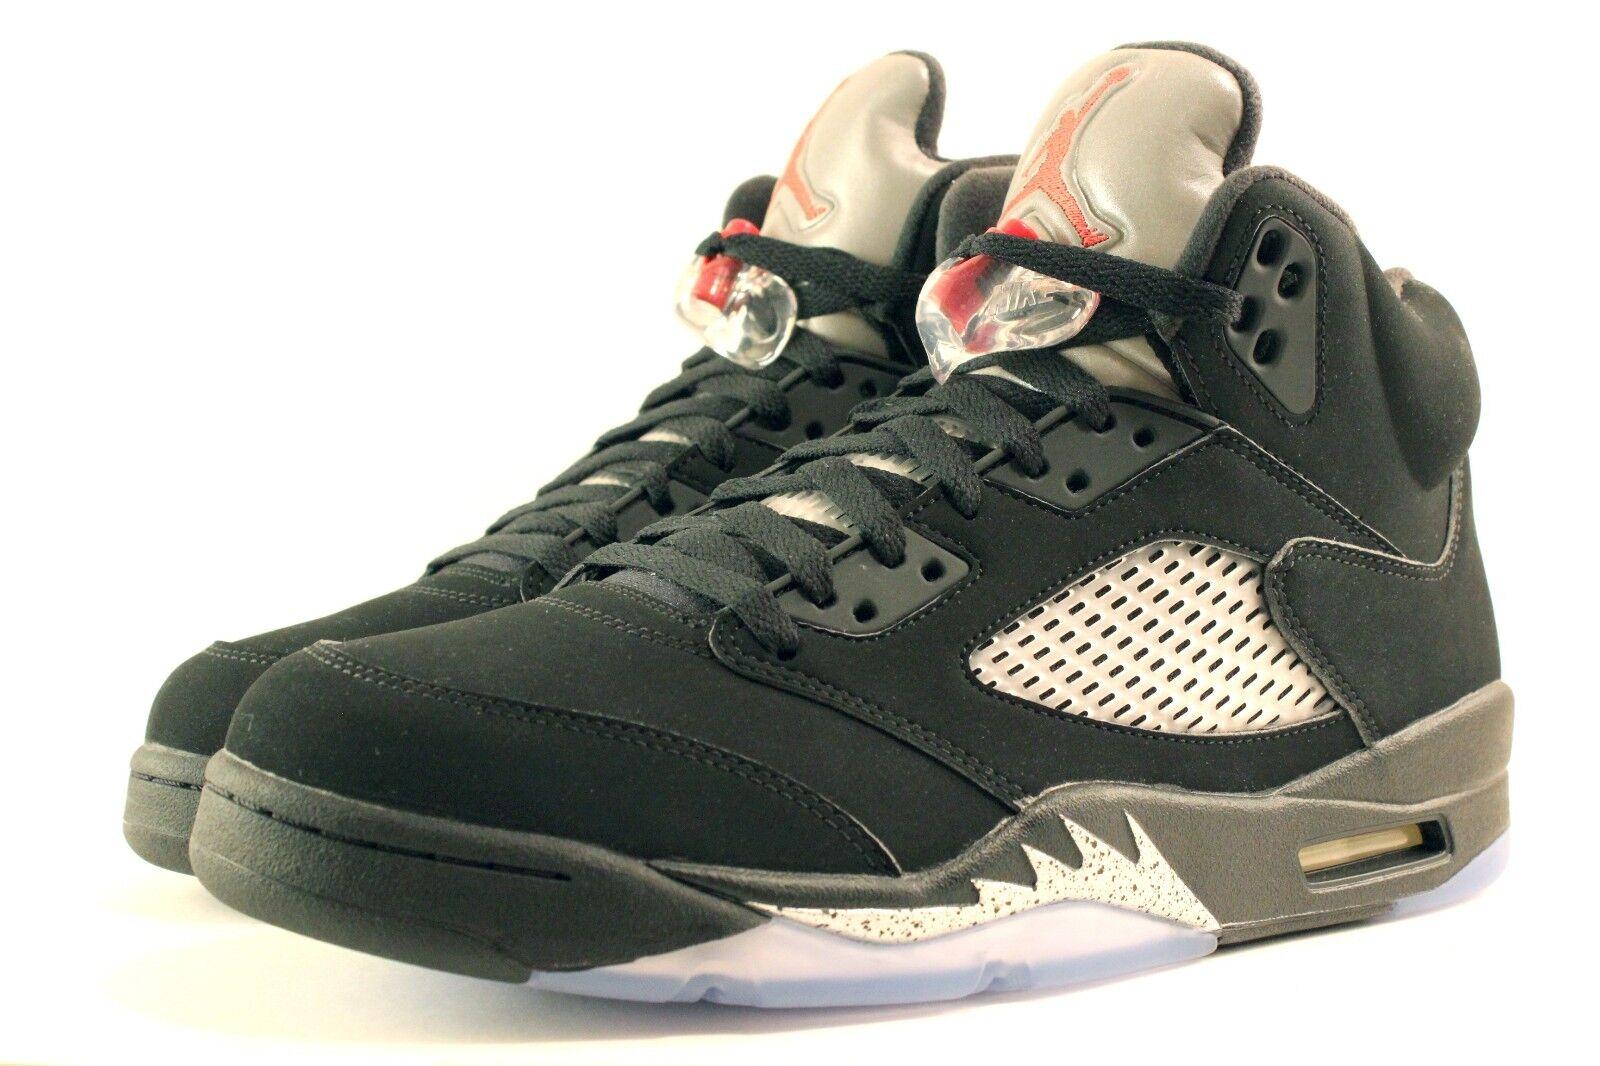 Nike air jordan retrò / 5 og nero argento metallico 845035-003 Uomo dimensioni ds